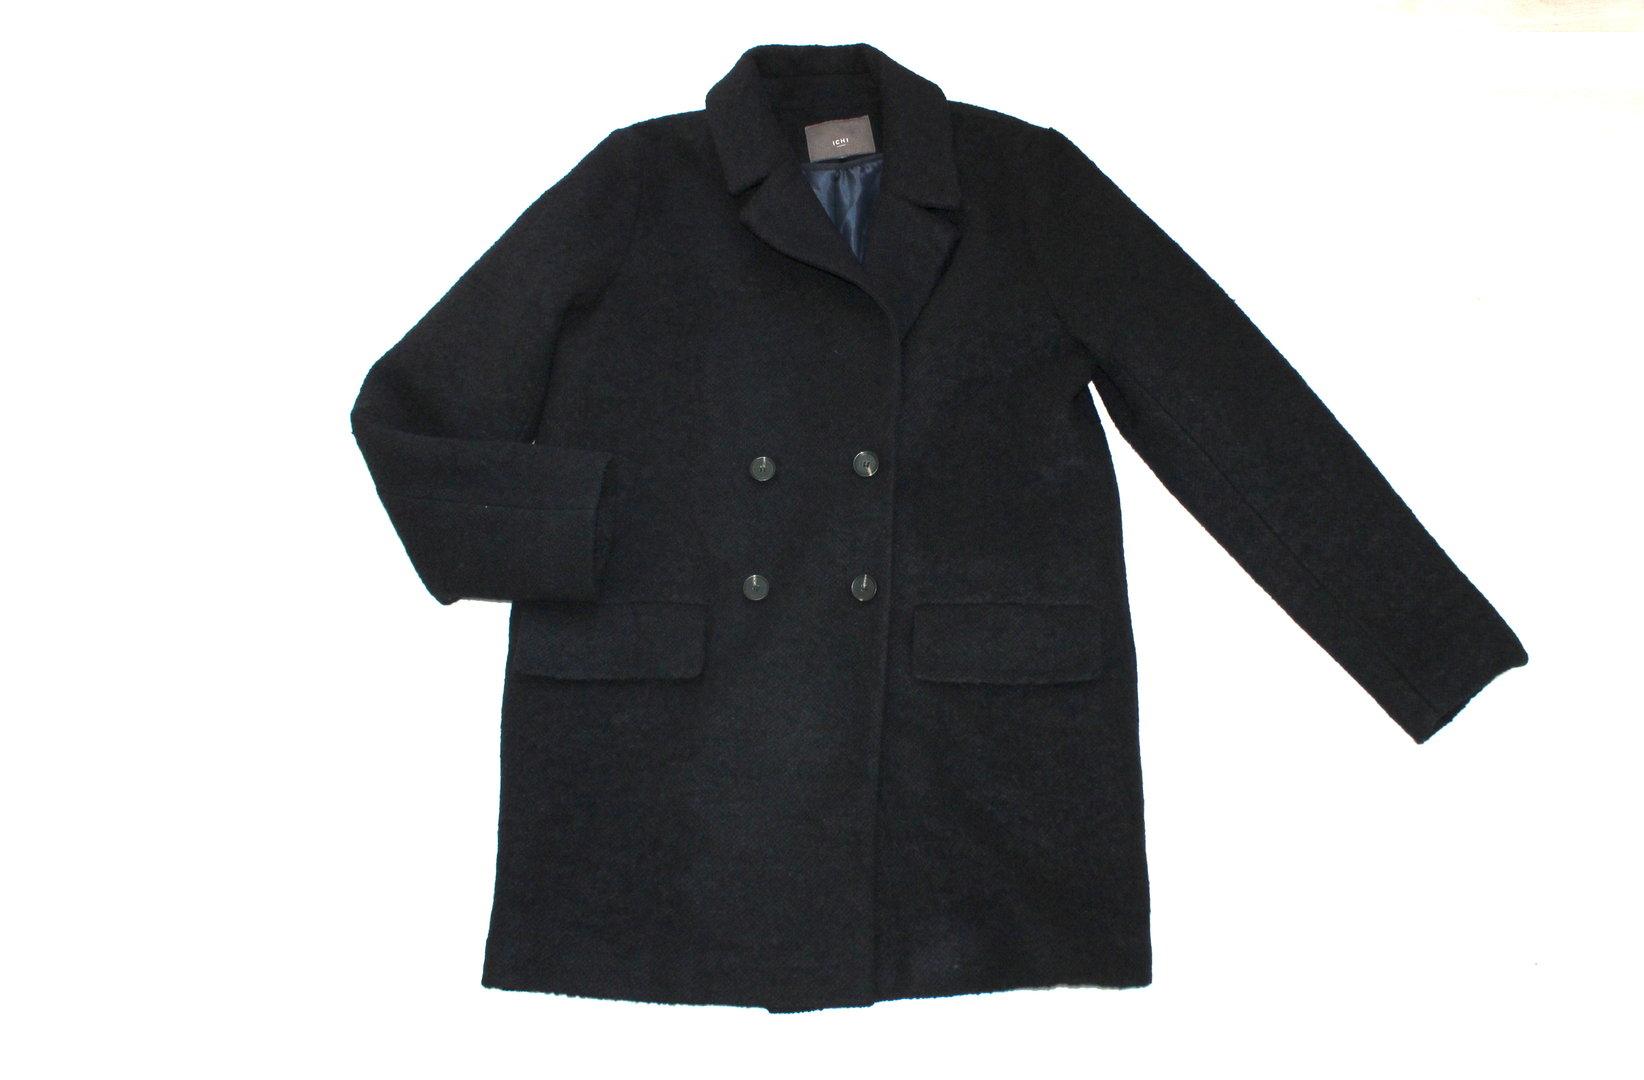 hot sale online 56ce0 e73ff ICHI Woll Kurz Mantel Damen Winter schwarz 40